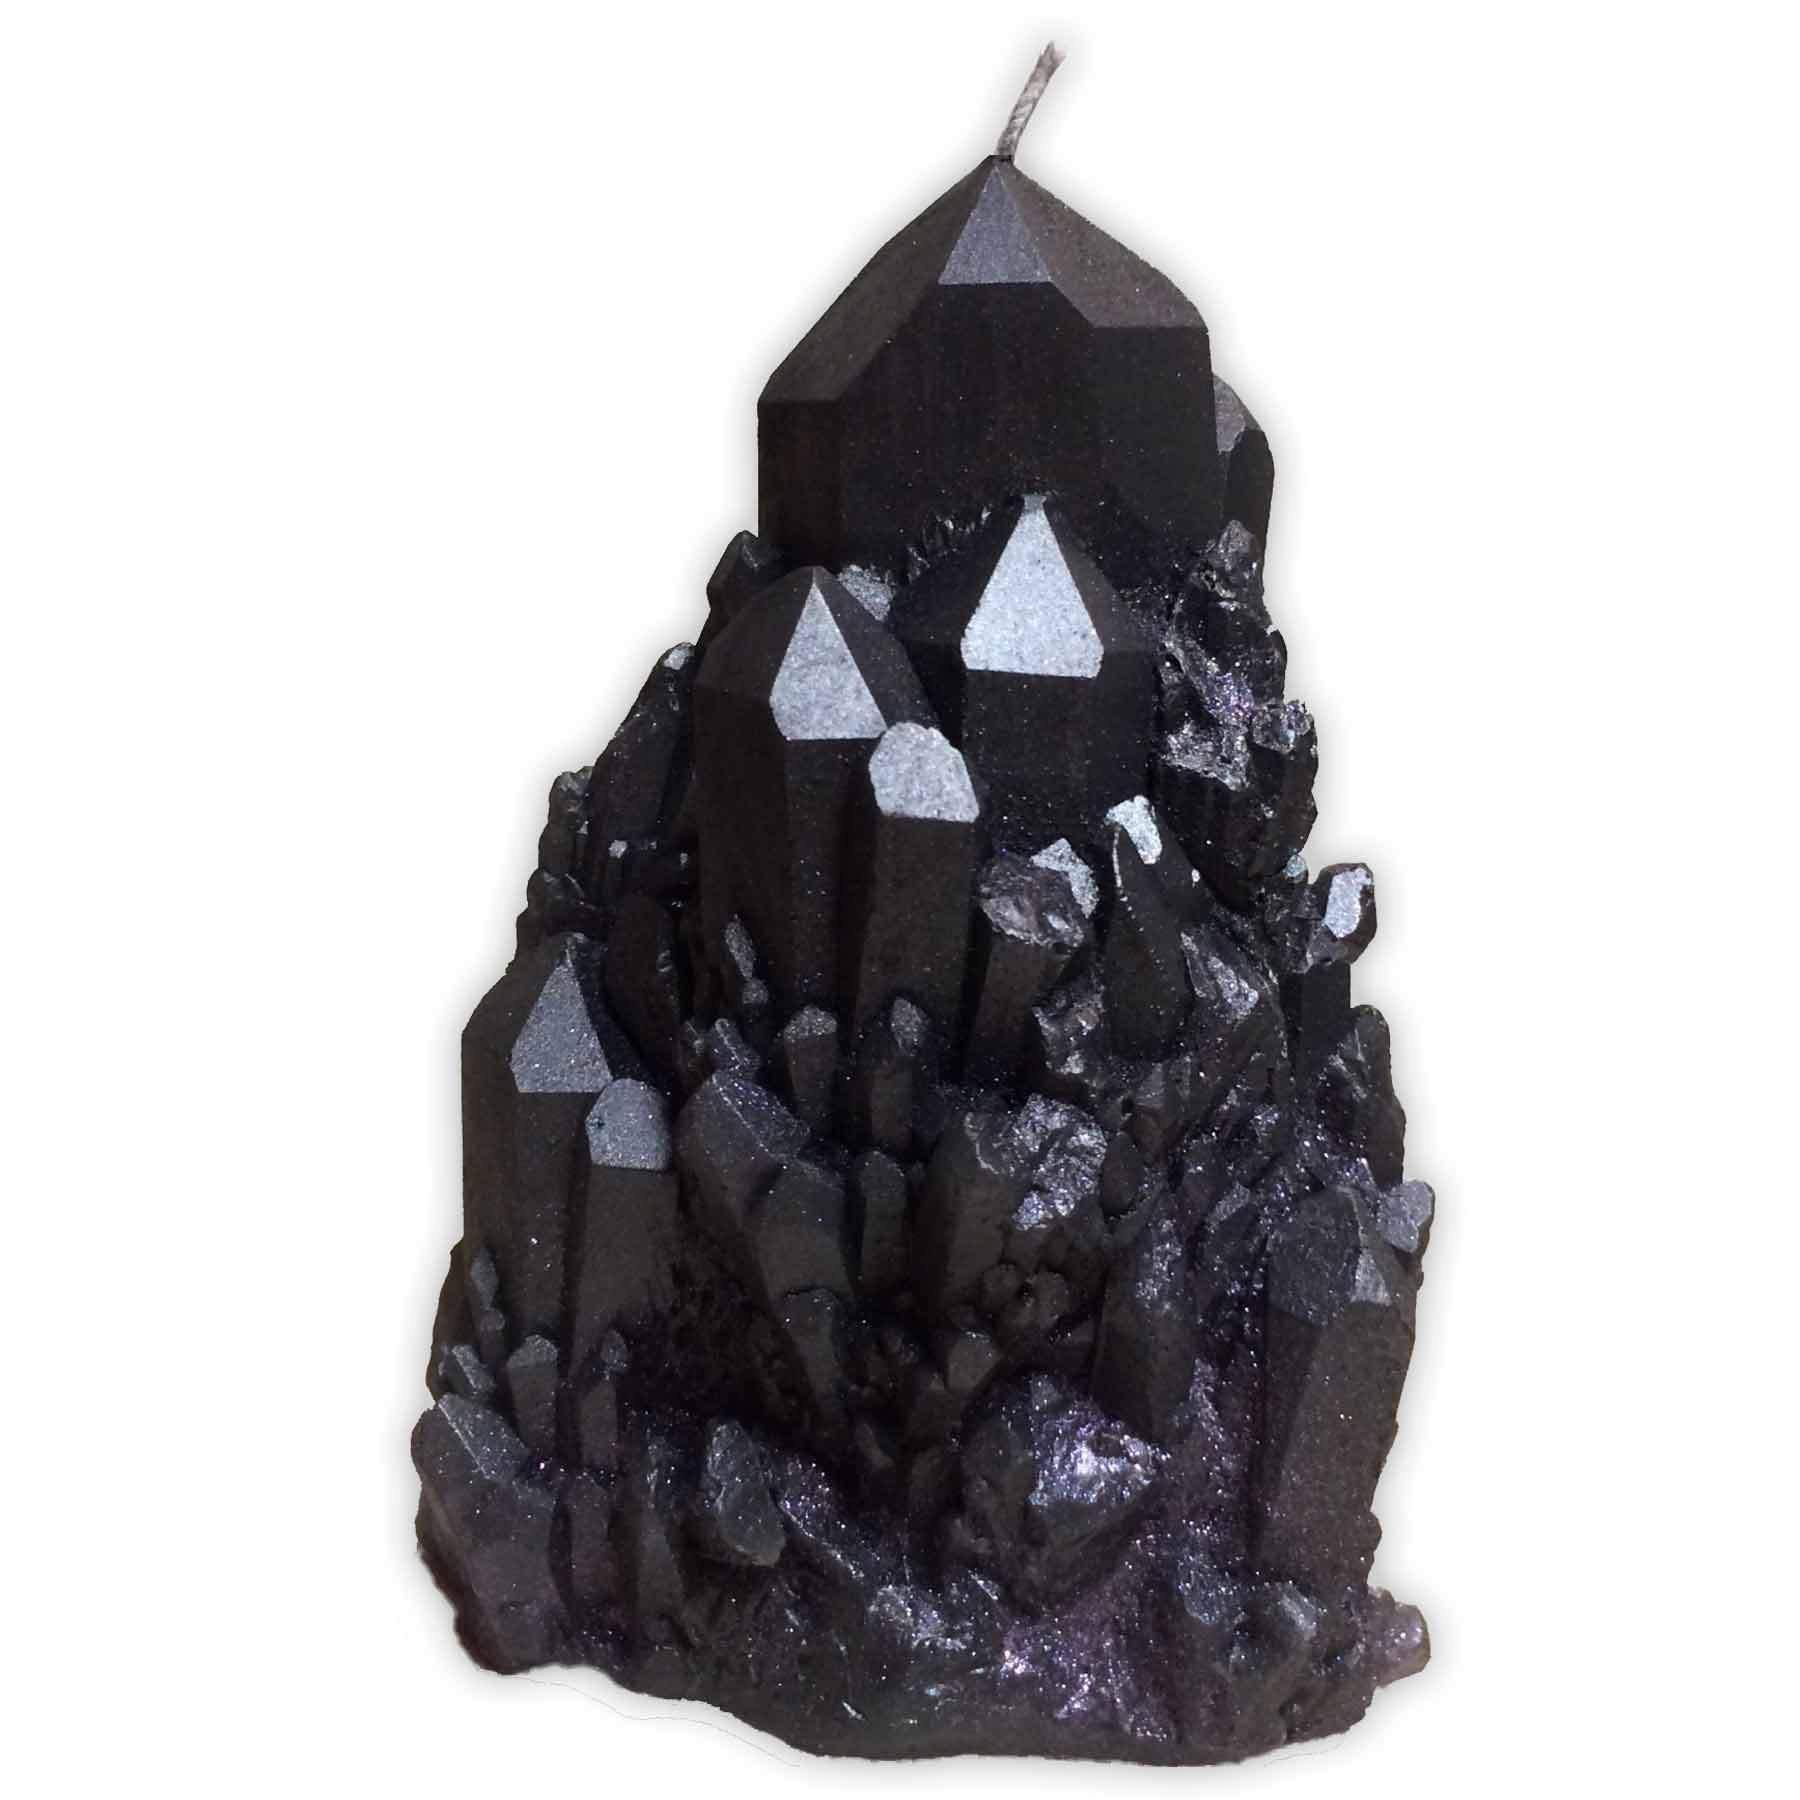 ABUNDANCE QUARTZ CRYSTAL Candle in Smokey Quartz (black)